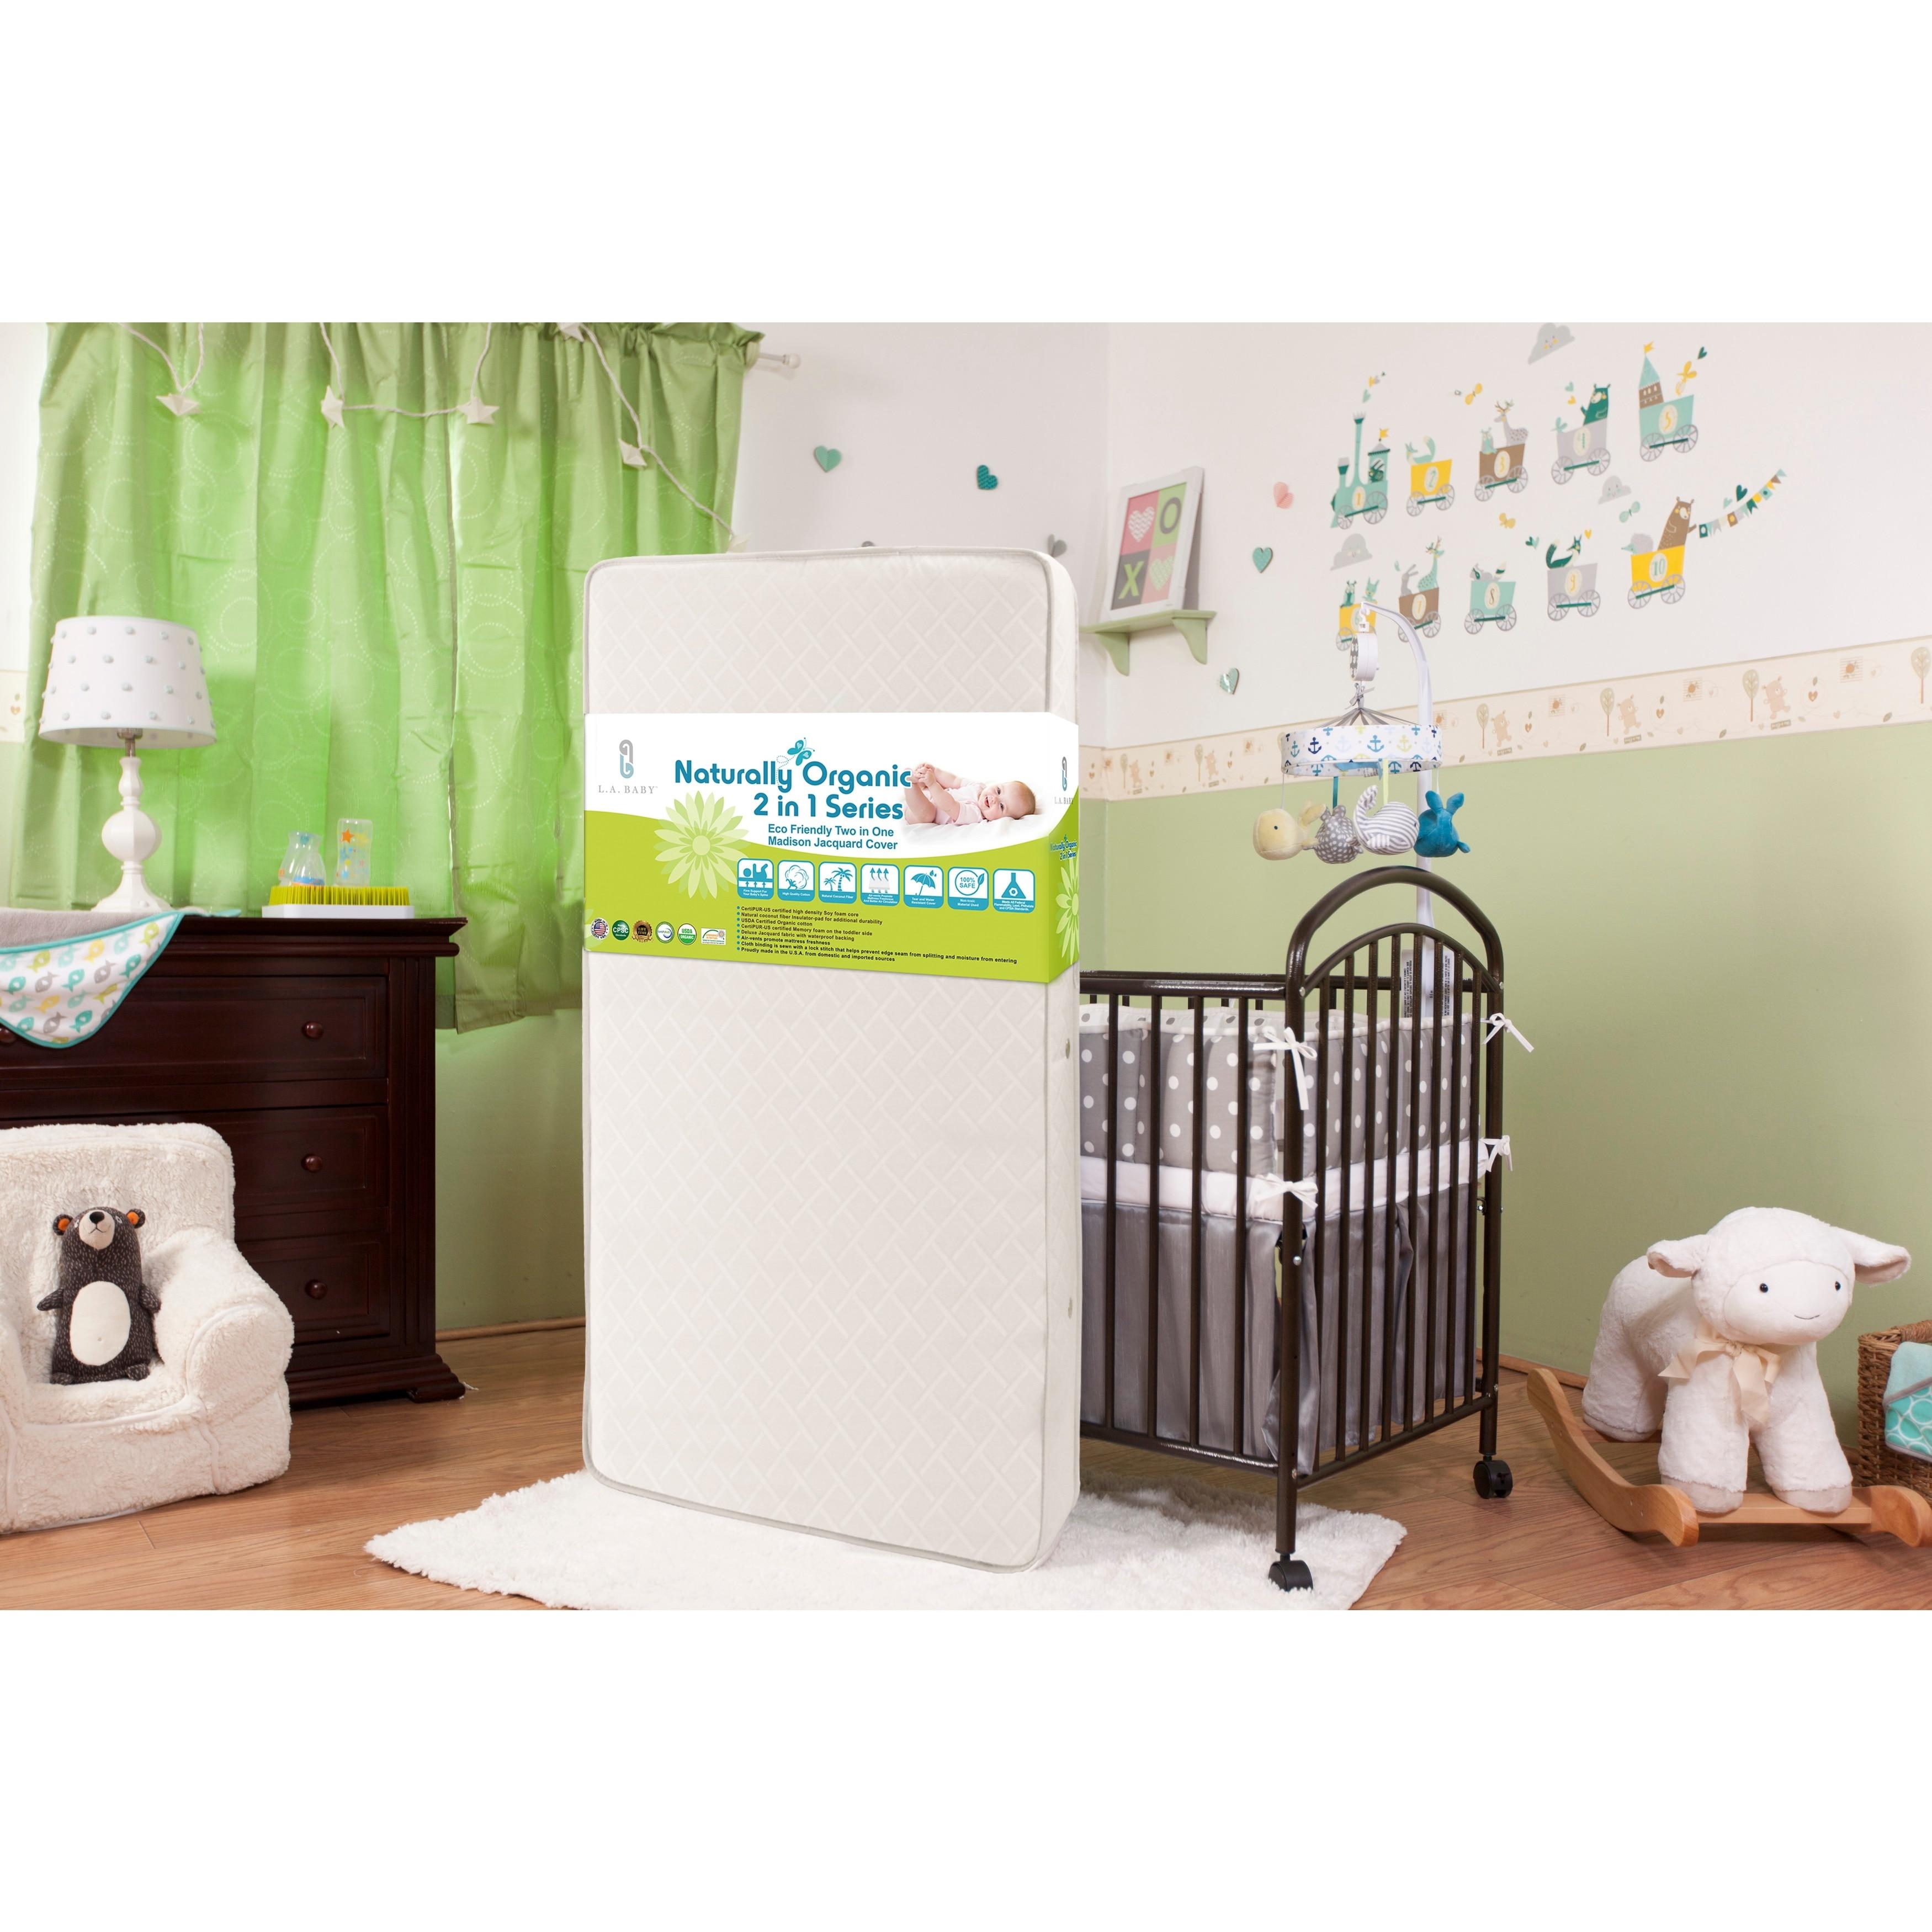 LA Baby Eco Friendly 2 in 1 Soy Foam Crib Mattress with Natural Coconut Fiber & Organic Cotton Layer, White